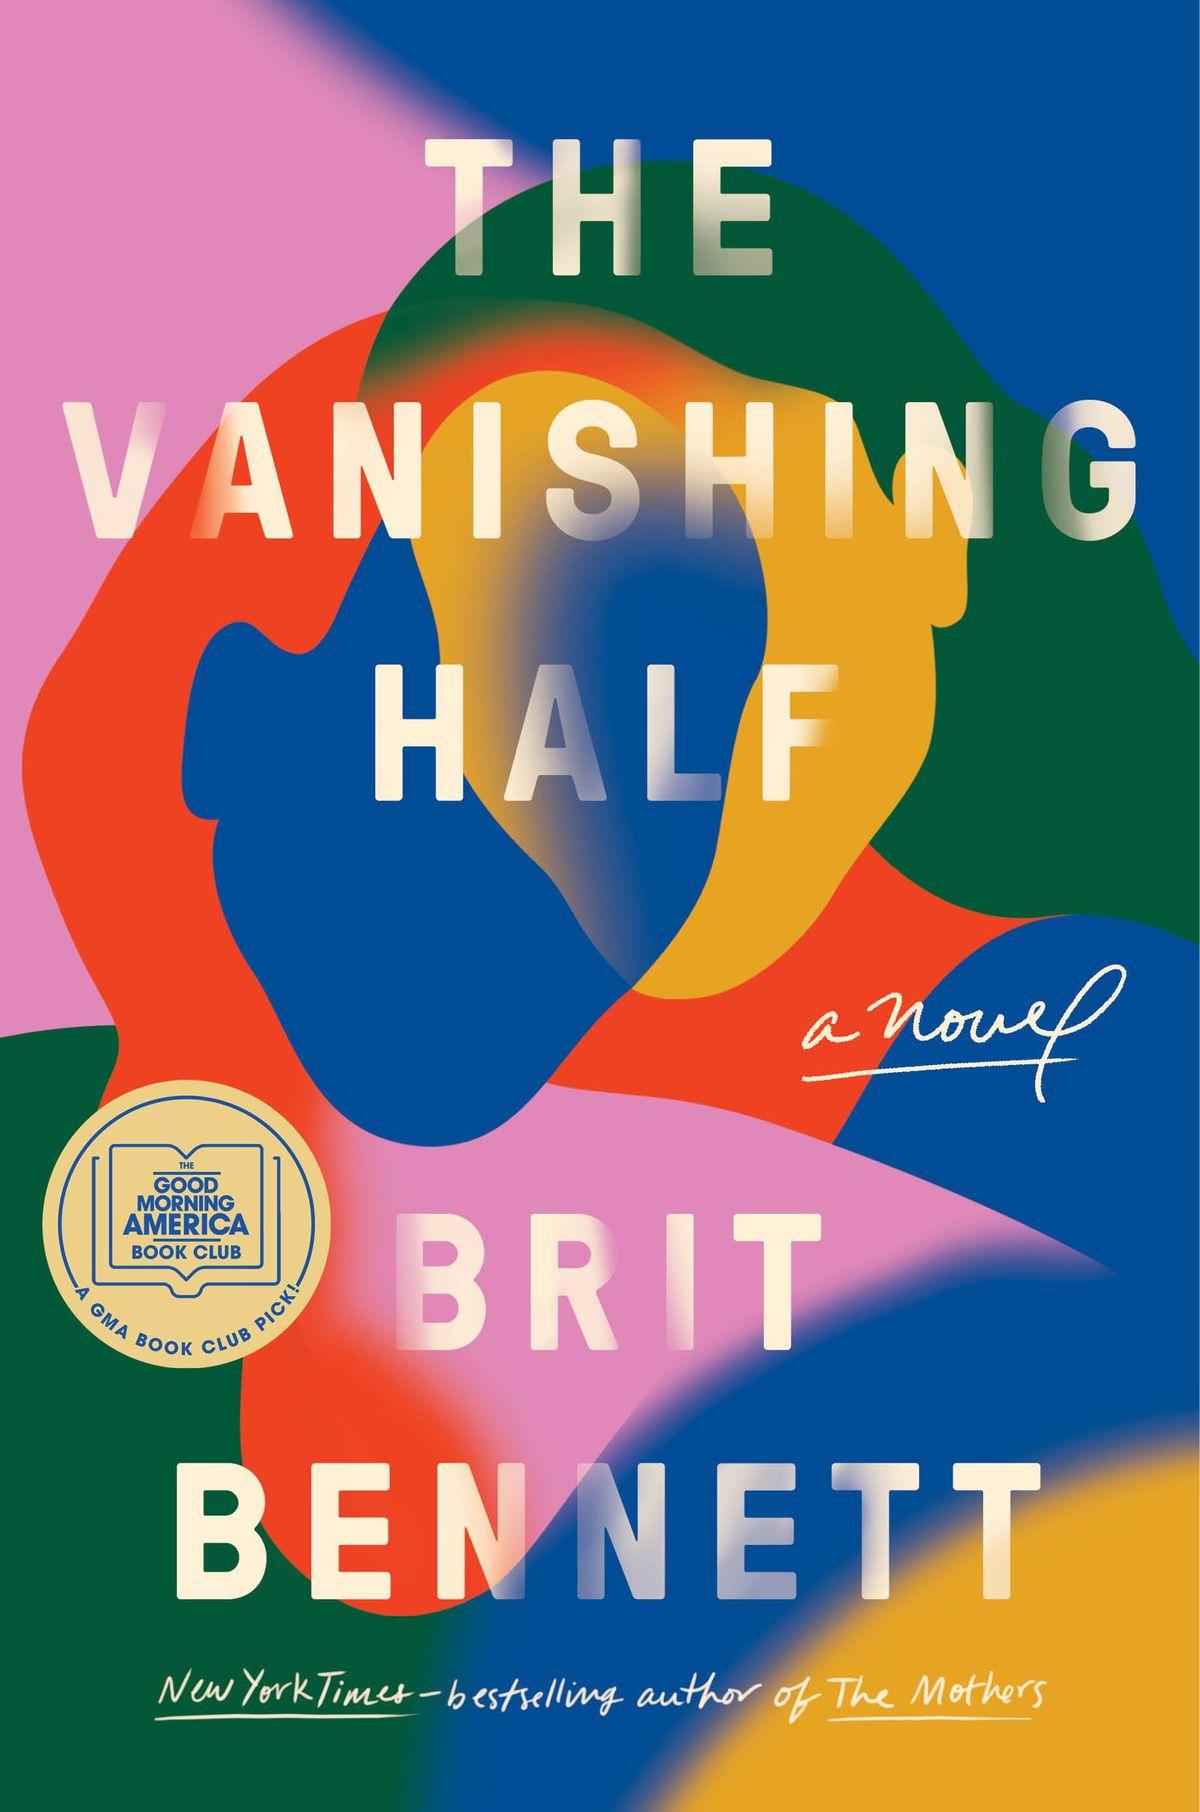 The Vanishing Half by Brit Bennett.